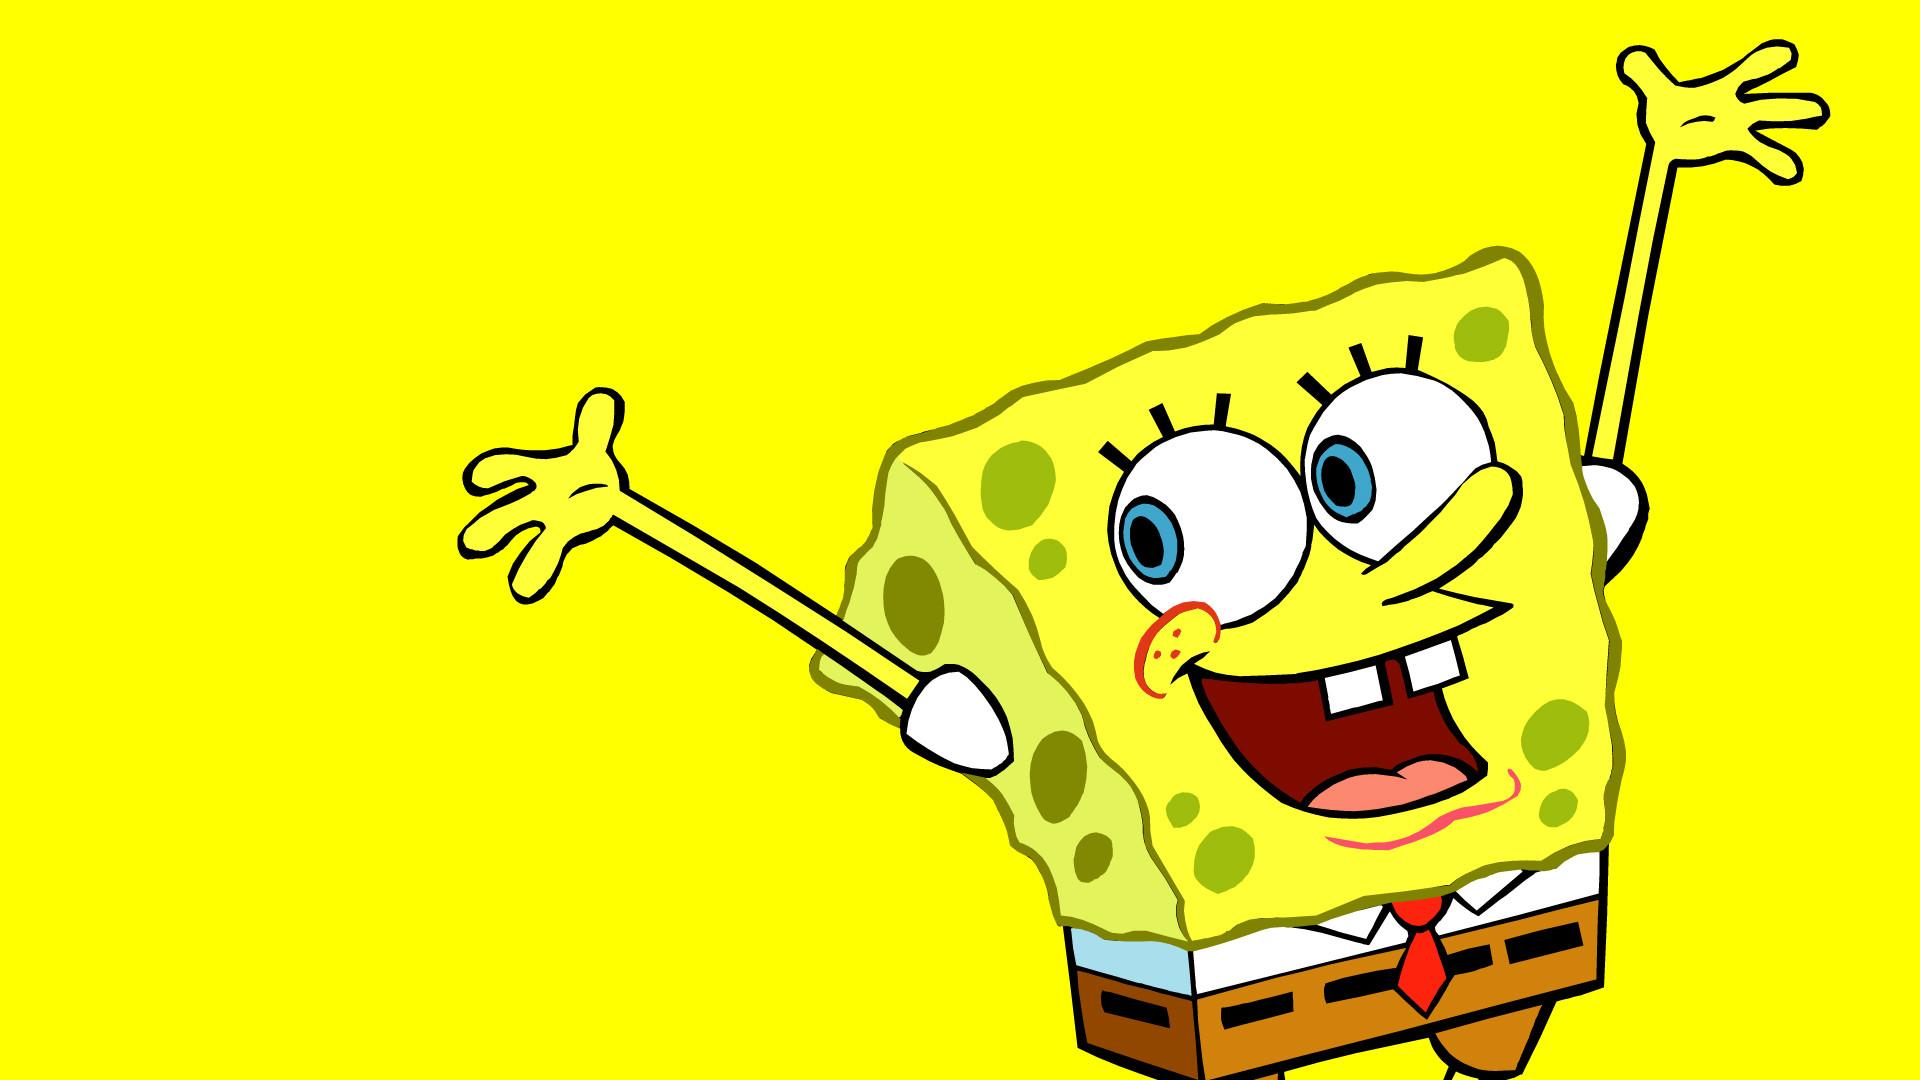 Spongebob Squarepants Happy Face Wallpaper